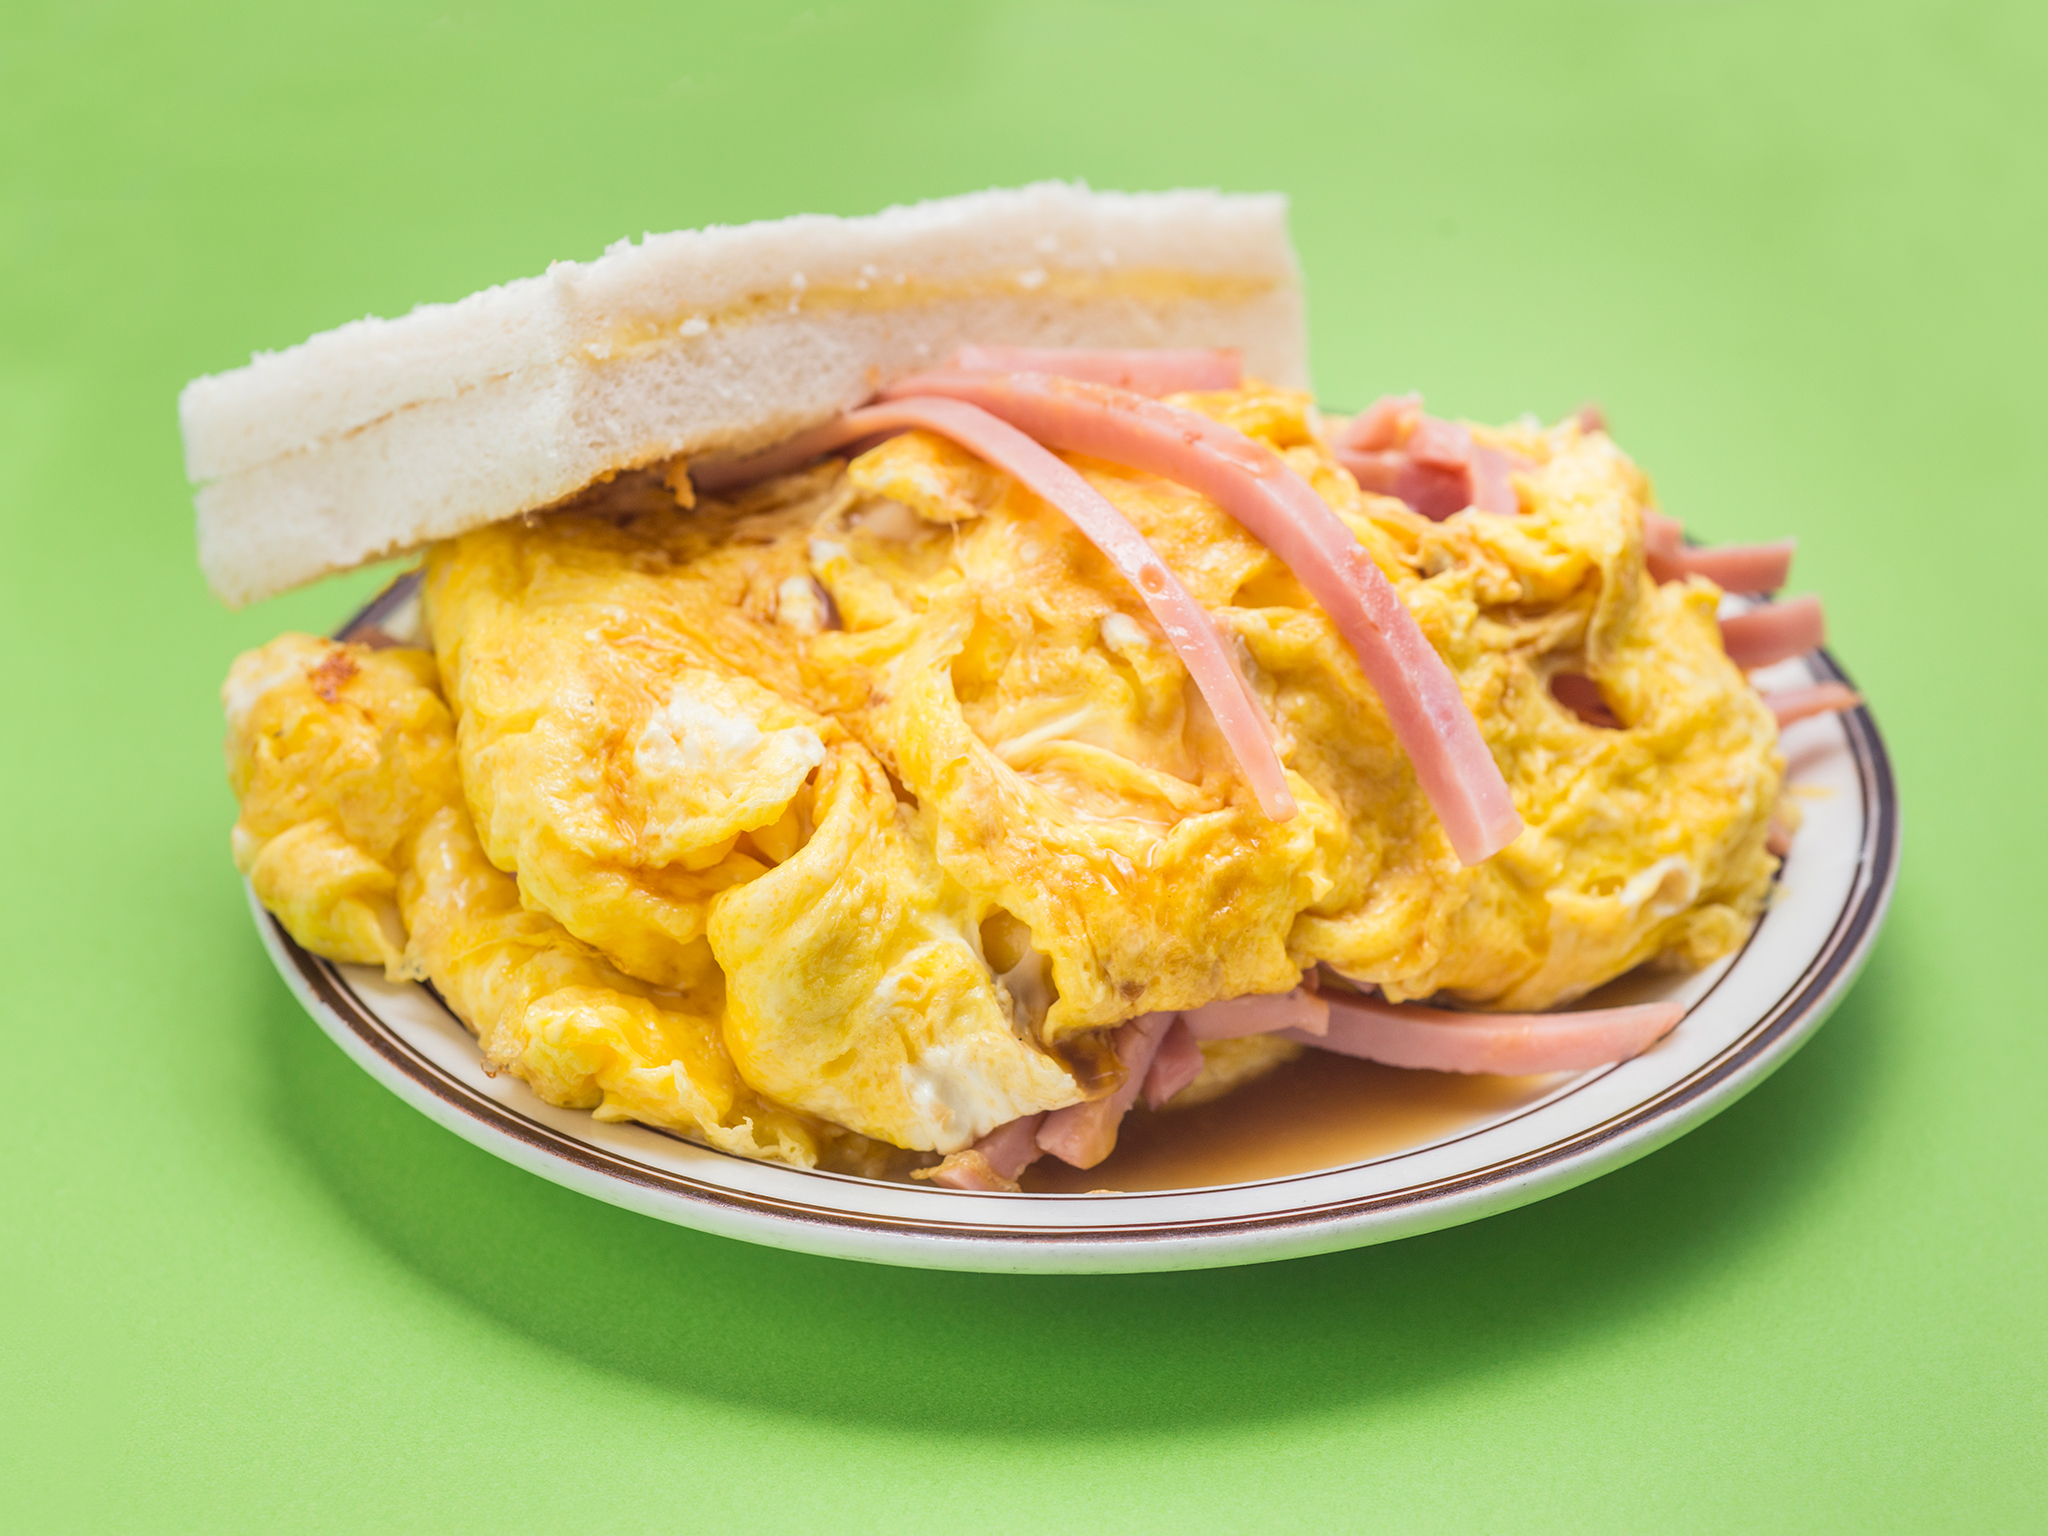 Scrambled egg and ham sandwich